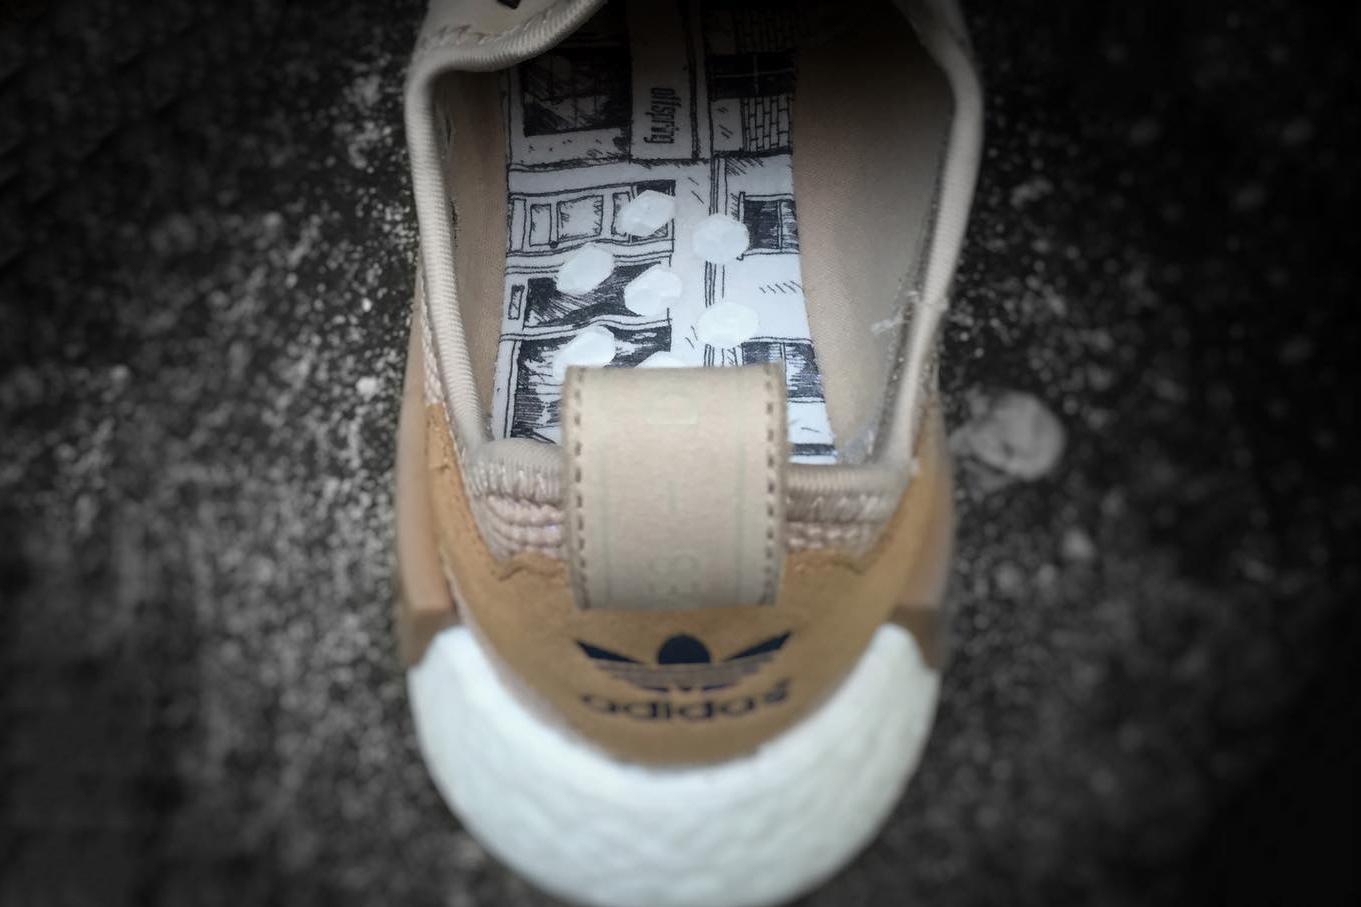 Offspring adidas Originals NMD Britpop Collaboration Teaser